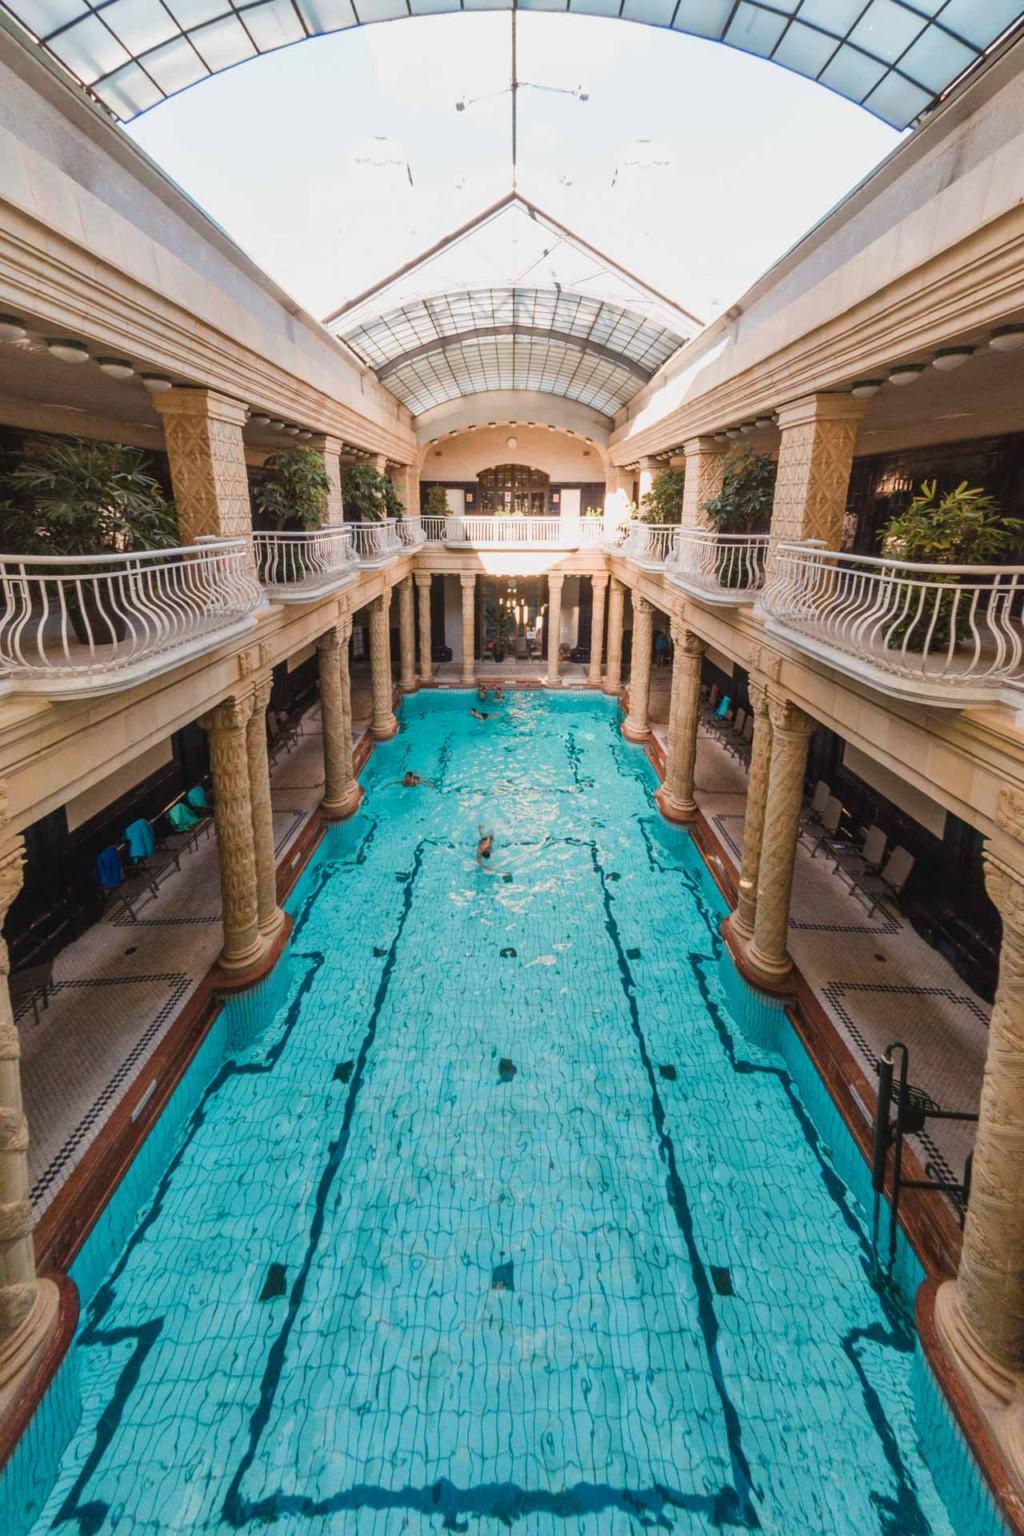 Géllert Baths, Thermal Bath, Budapest, Hungary